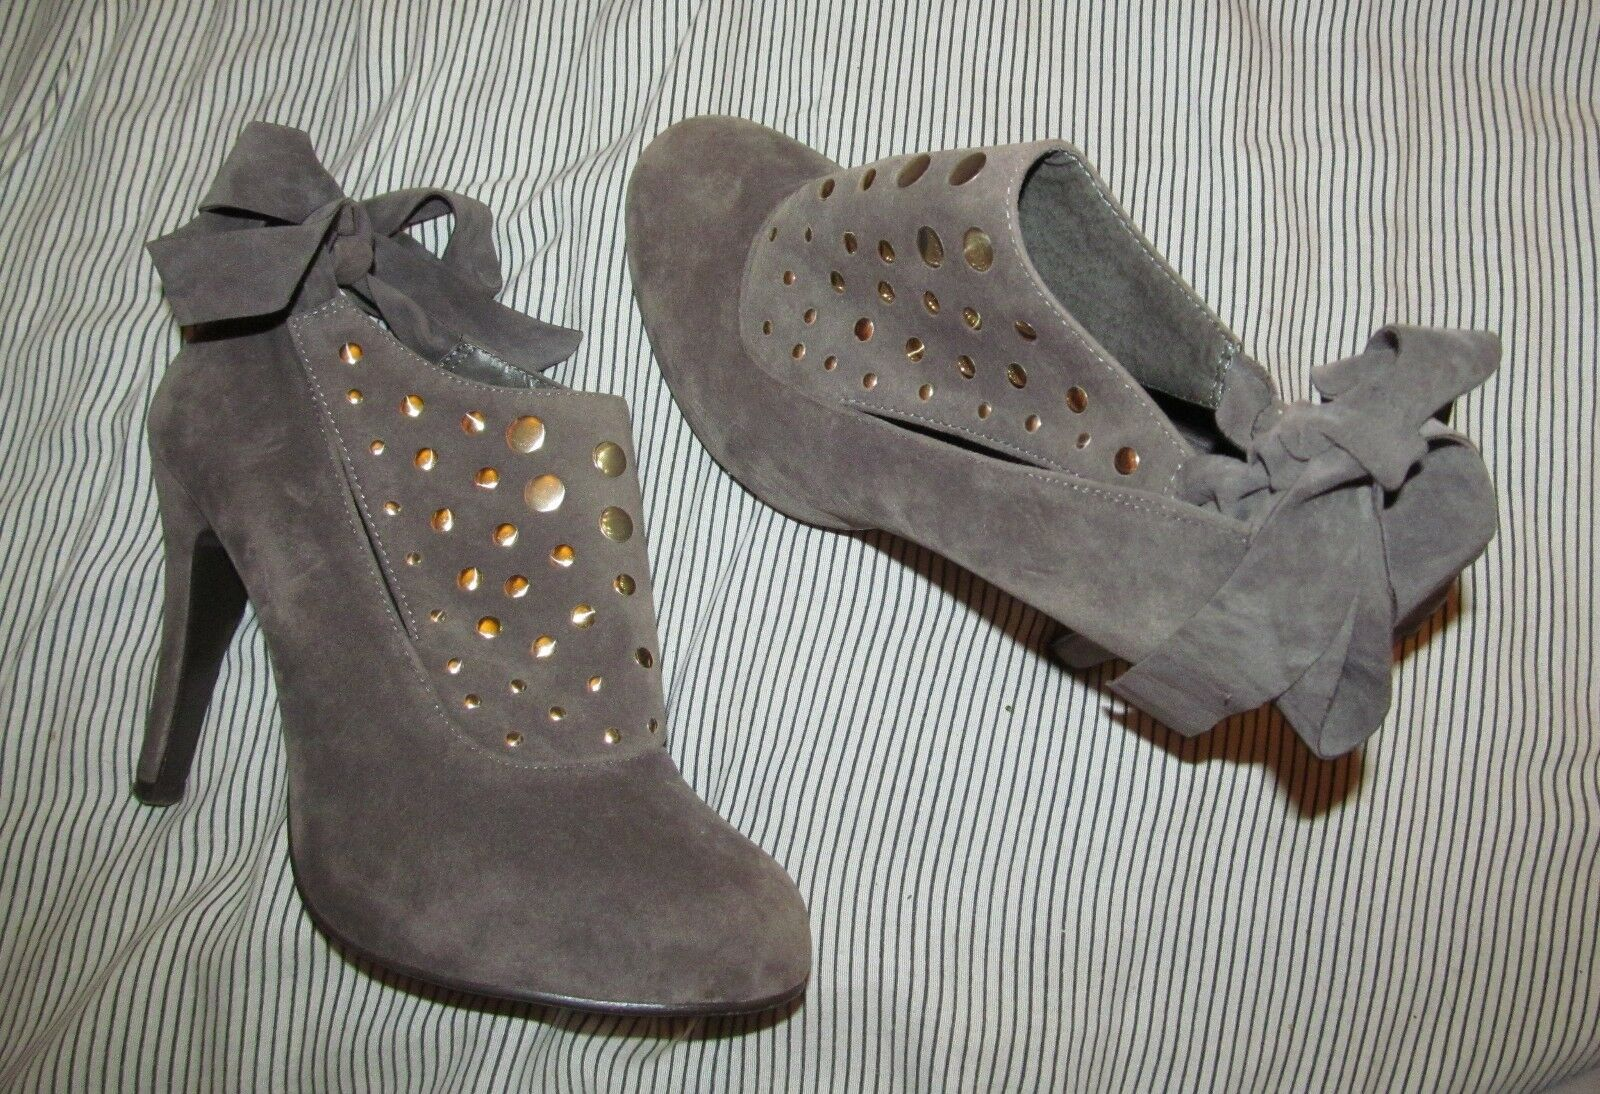 Malni by Pepe Brown velvet-y bootie faux suede high heel bootie velvet-y shootie back tie size 7 ce2ec3